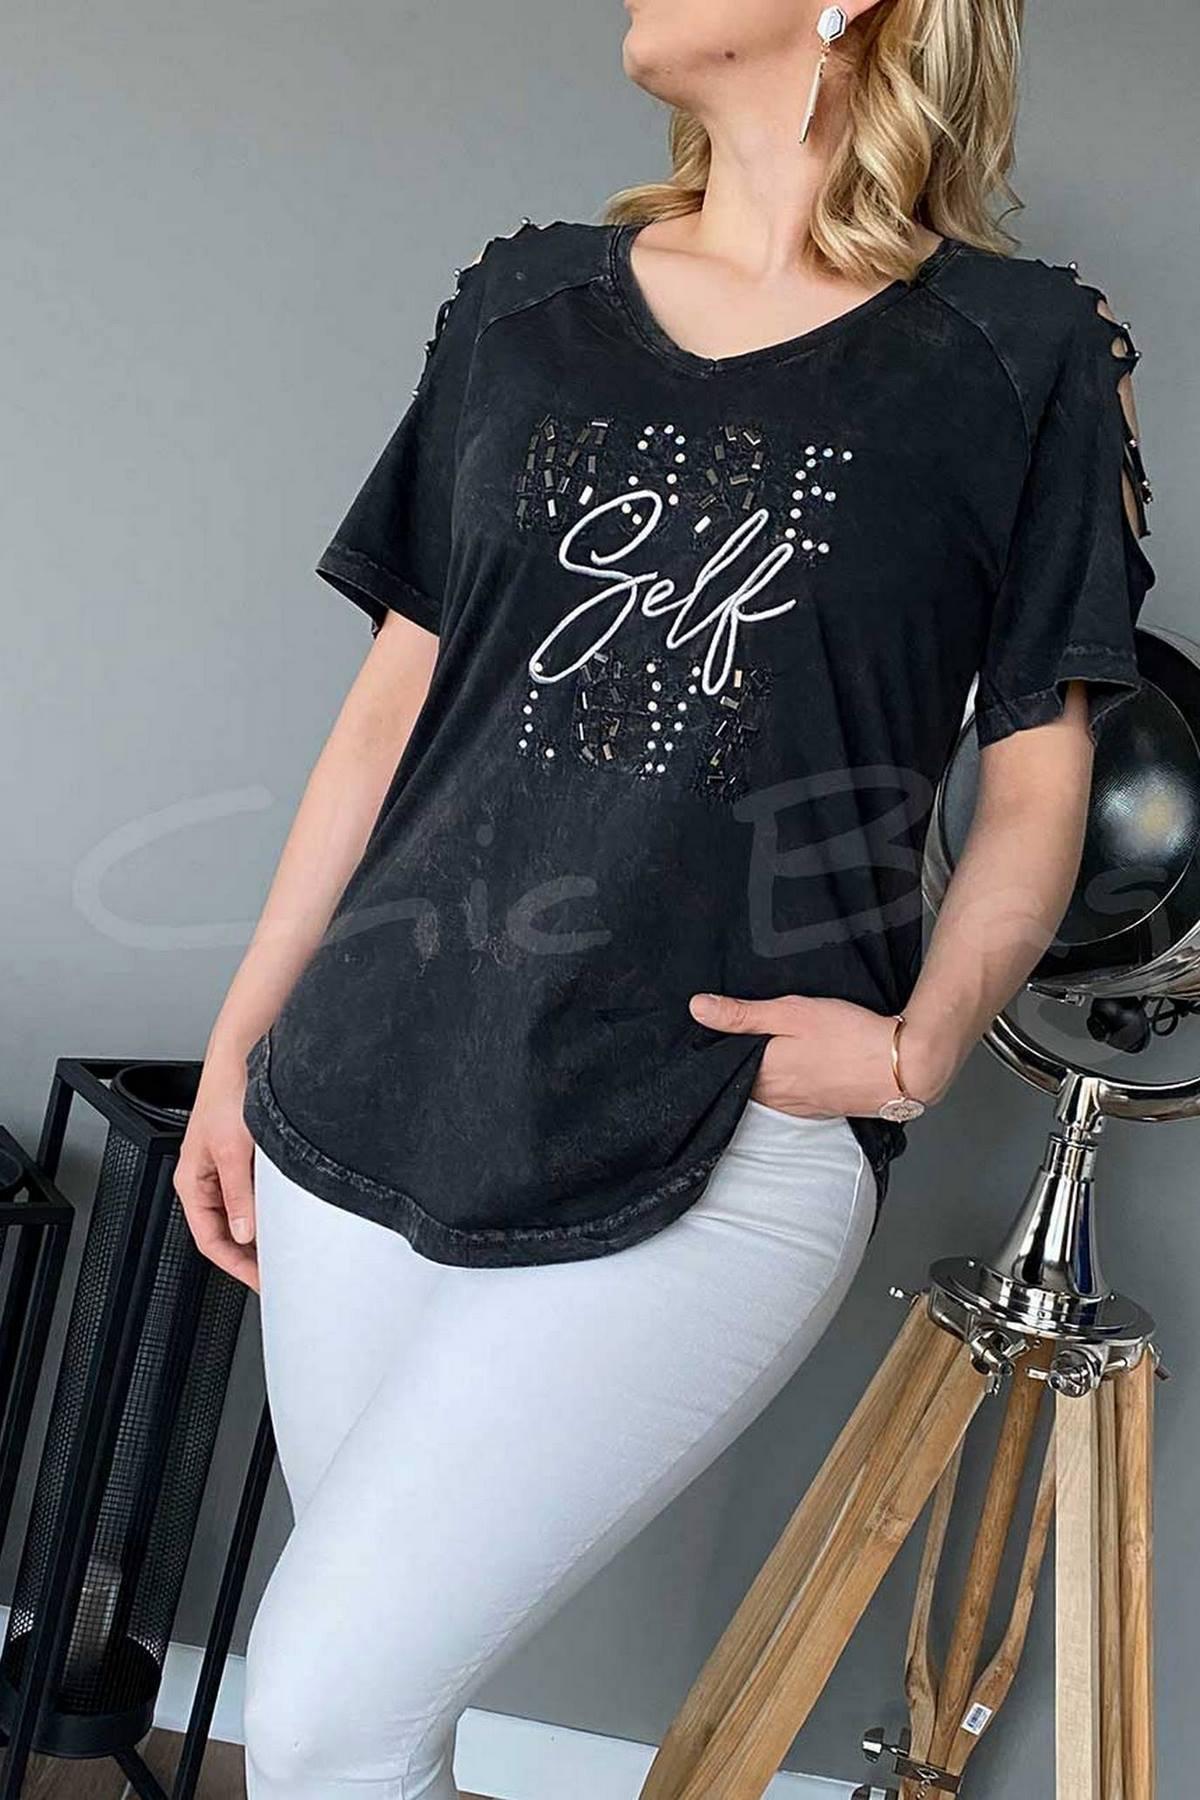 https://resim.chicbag.com.tr/p000816/ant/more-self-love-baski-omuz-kesik-dekolteli-v-yaka-t-shirt-swns-01e08247a0ee.